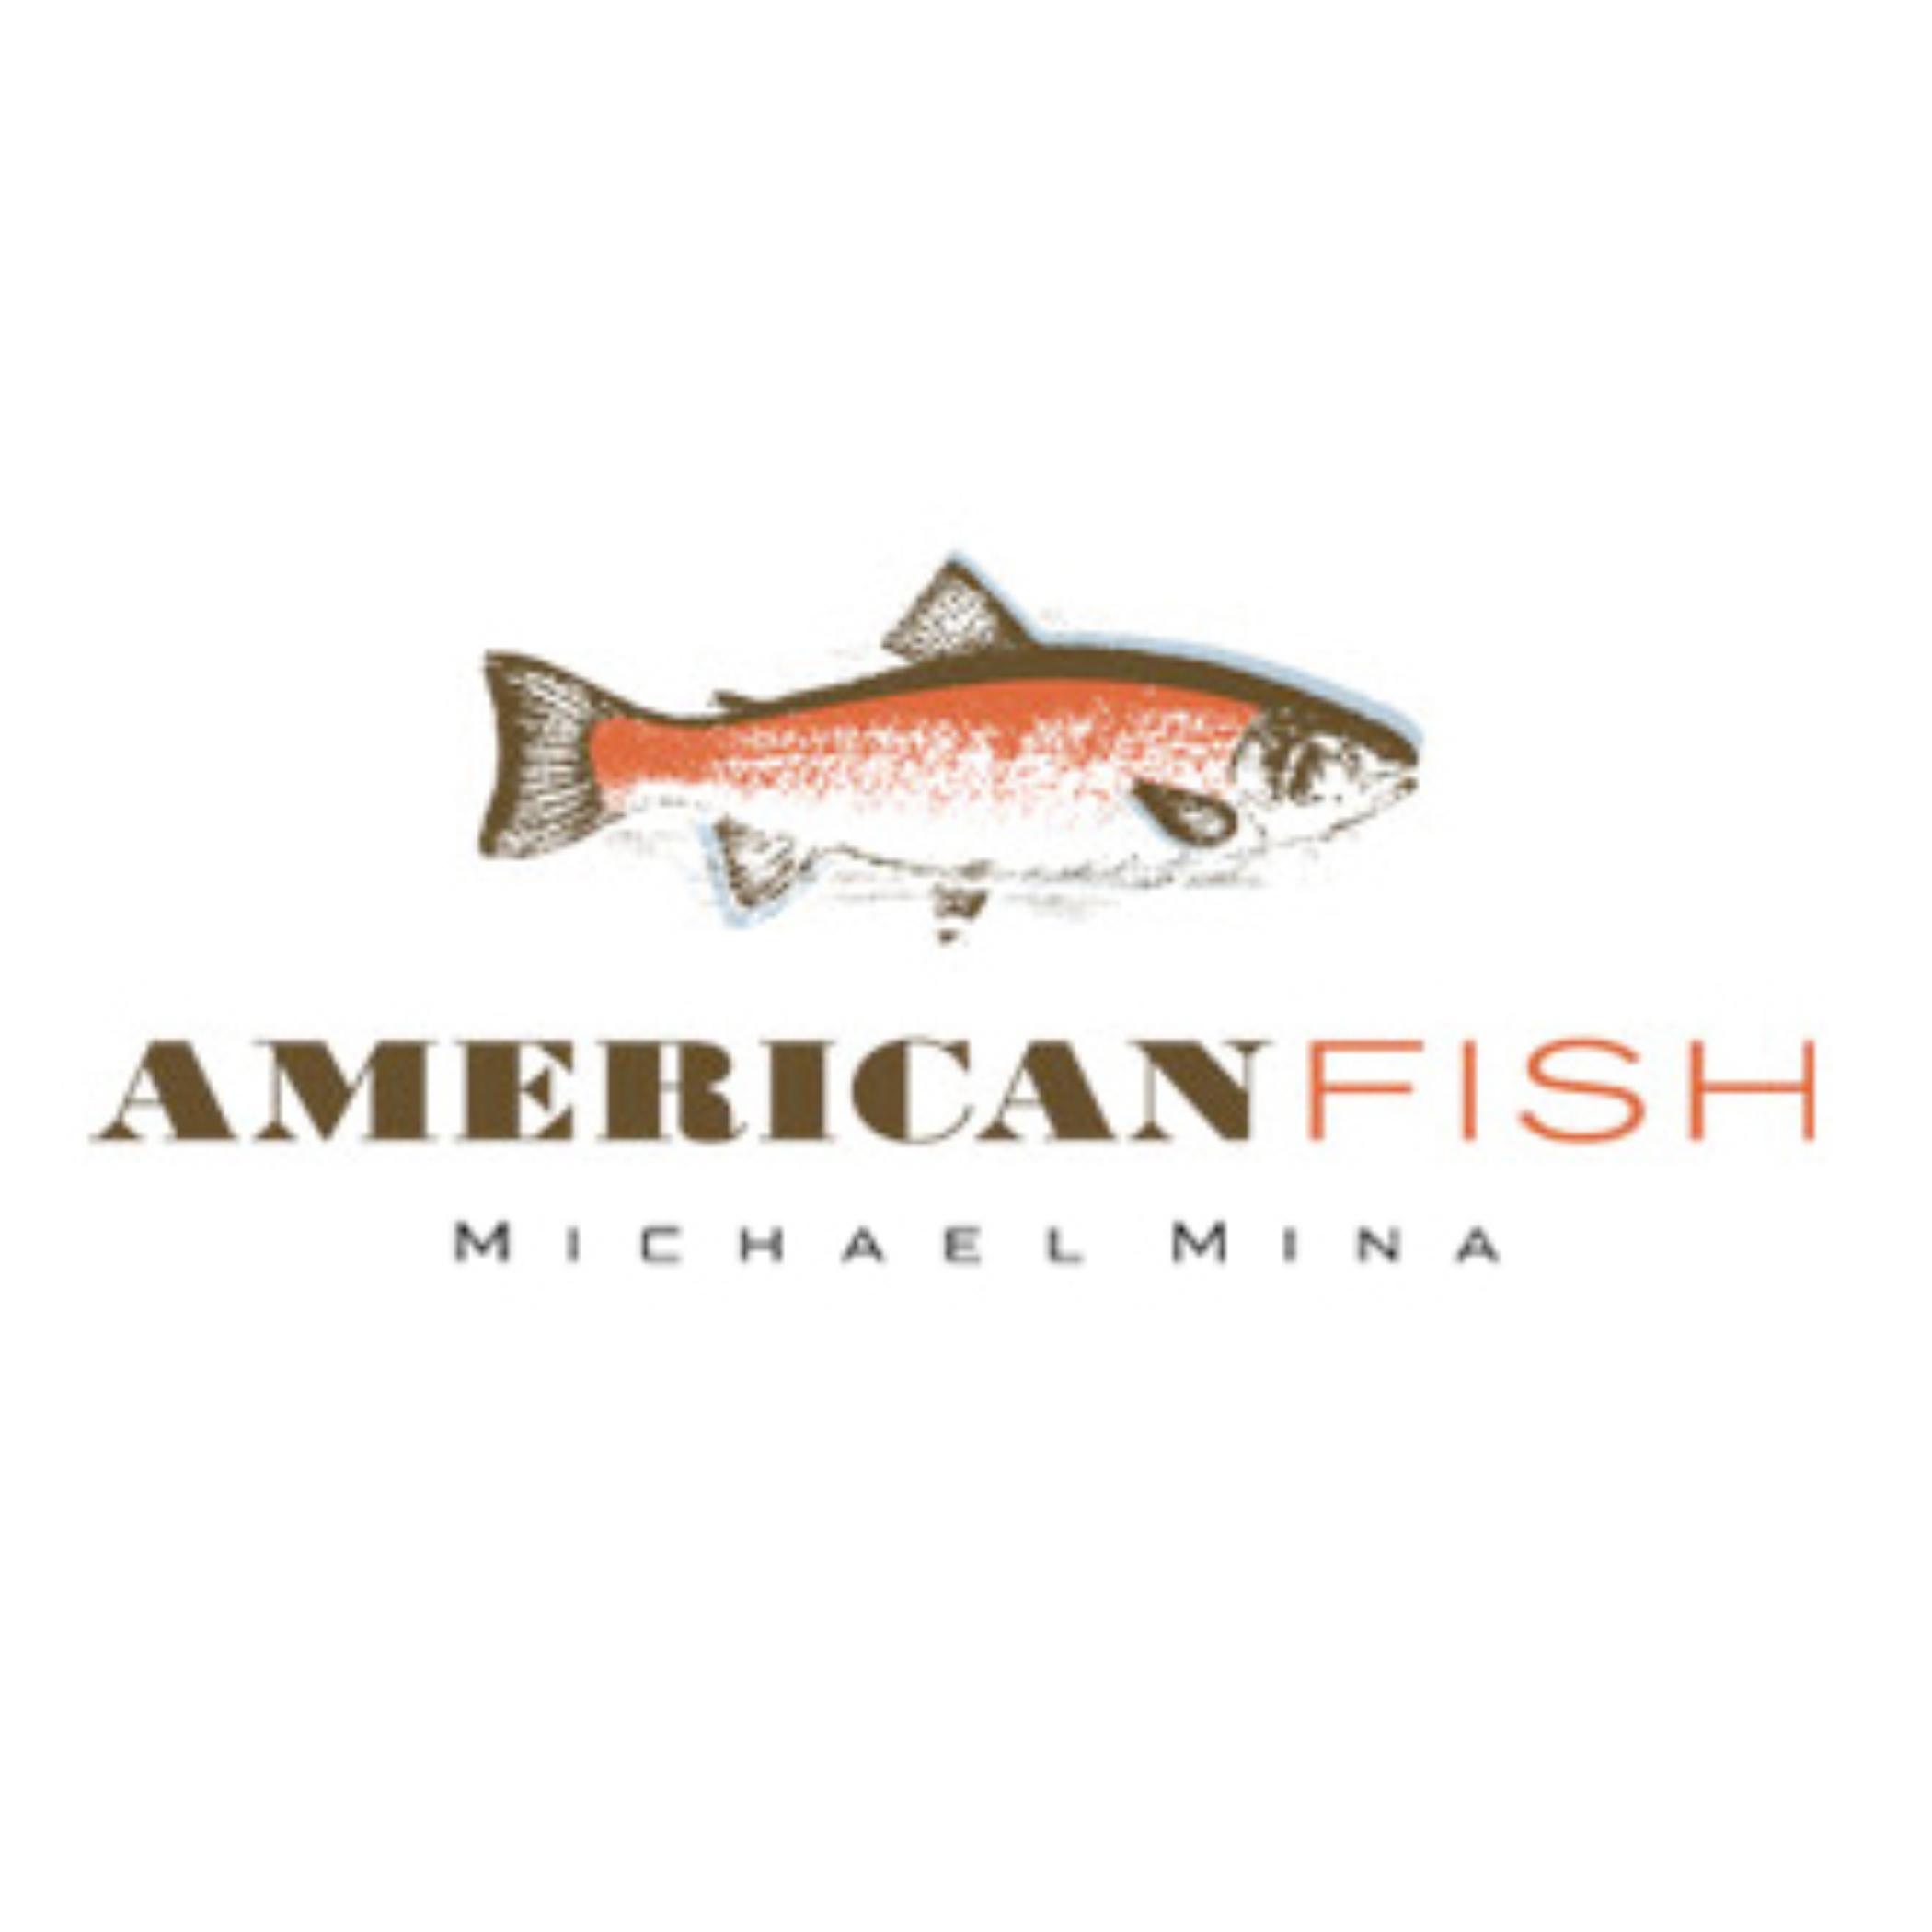 kelsy-zimba-zform-american-fish.jpg